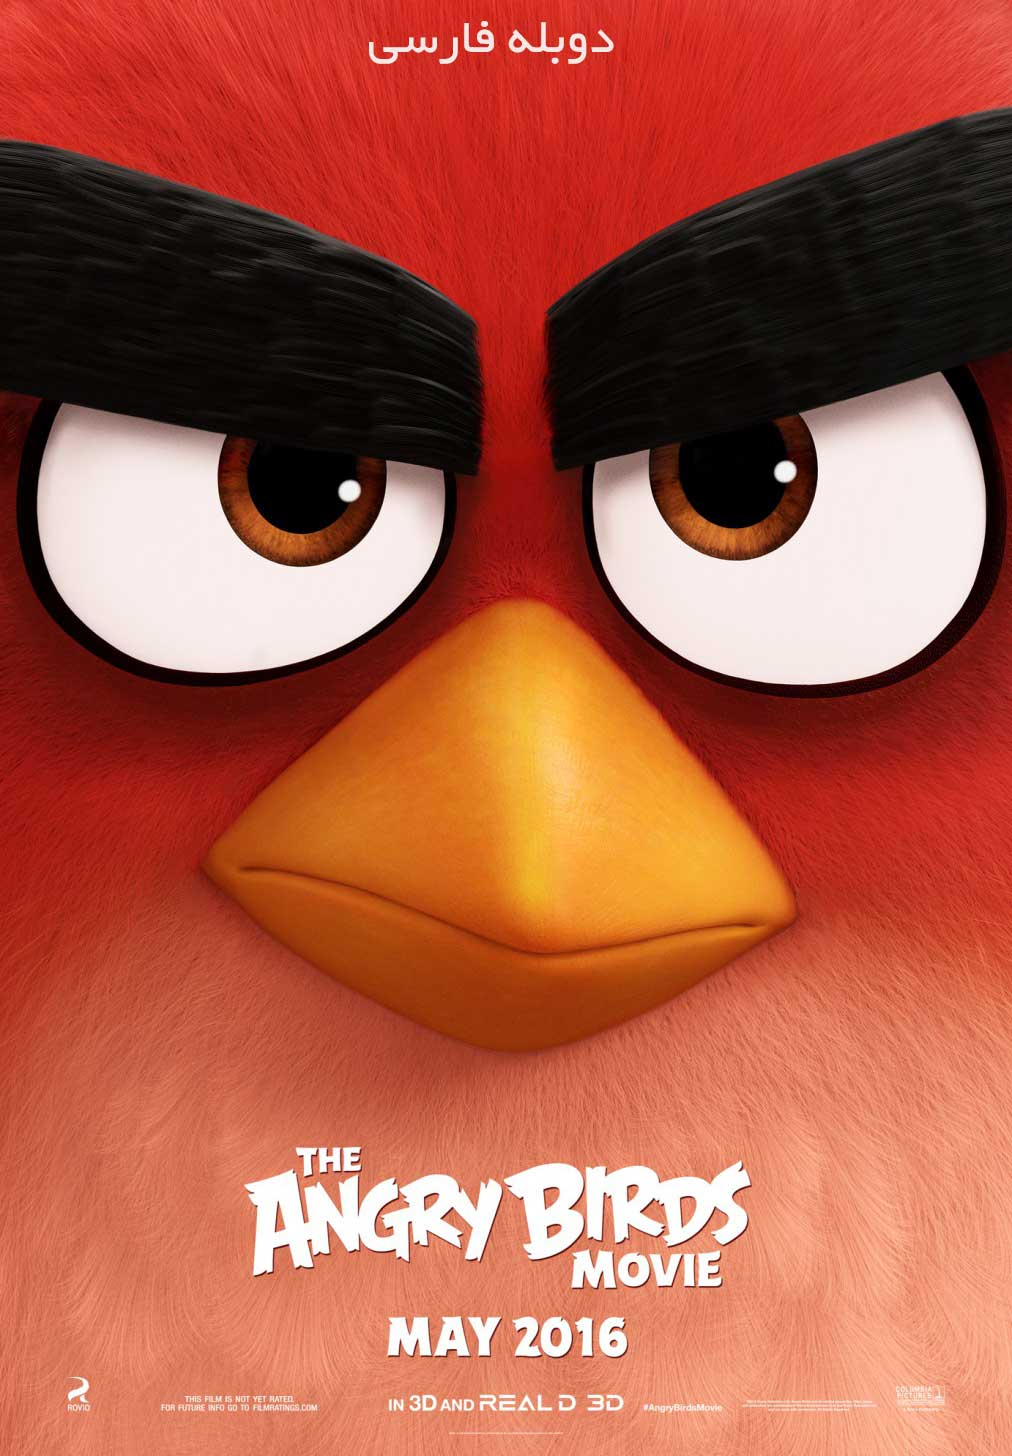 Angry birds 2016 - دانلود انیمیشن Angry birds 2016 با لینک مستقیم و به صورت رایگان